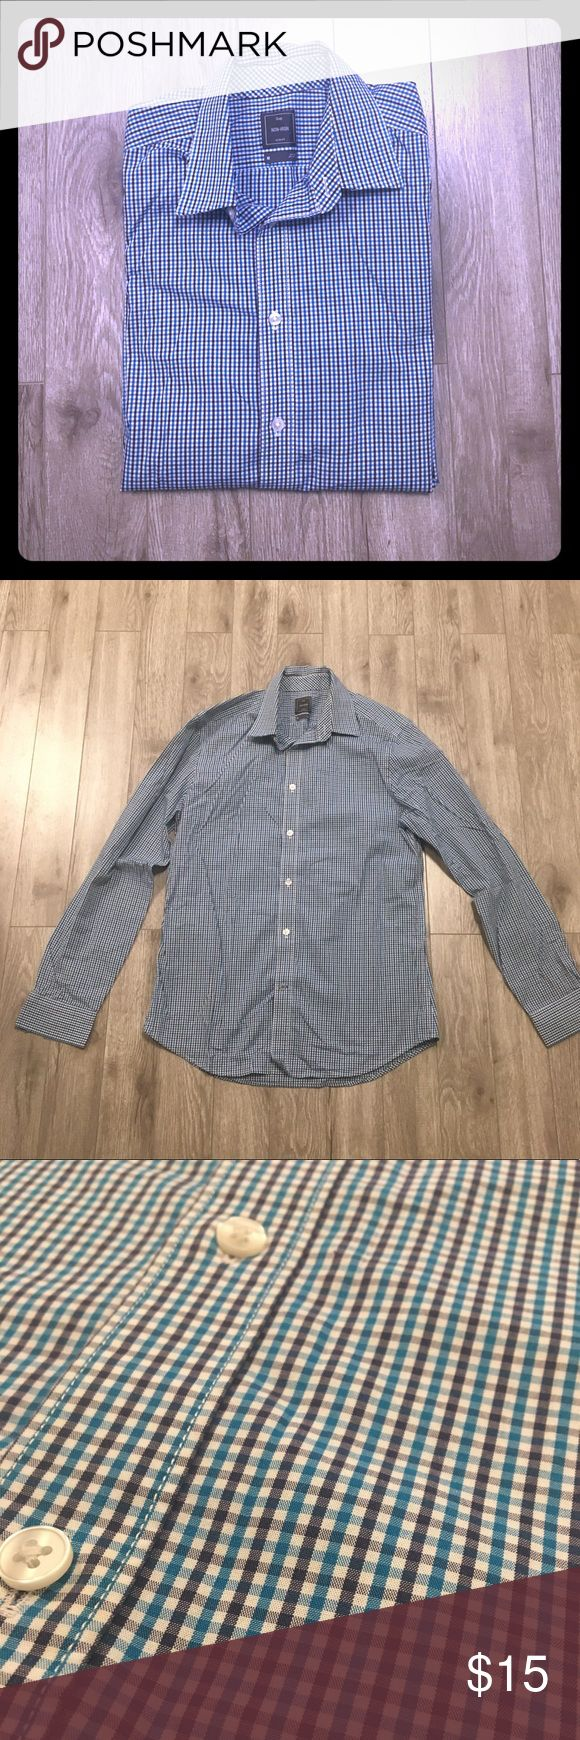 GAP men's dress shirt Gap non iron slim fit dress shirt. New without tags. Perfect condition. Shirts Dress Shirts